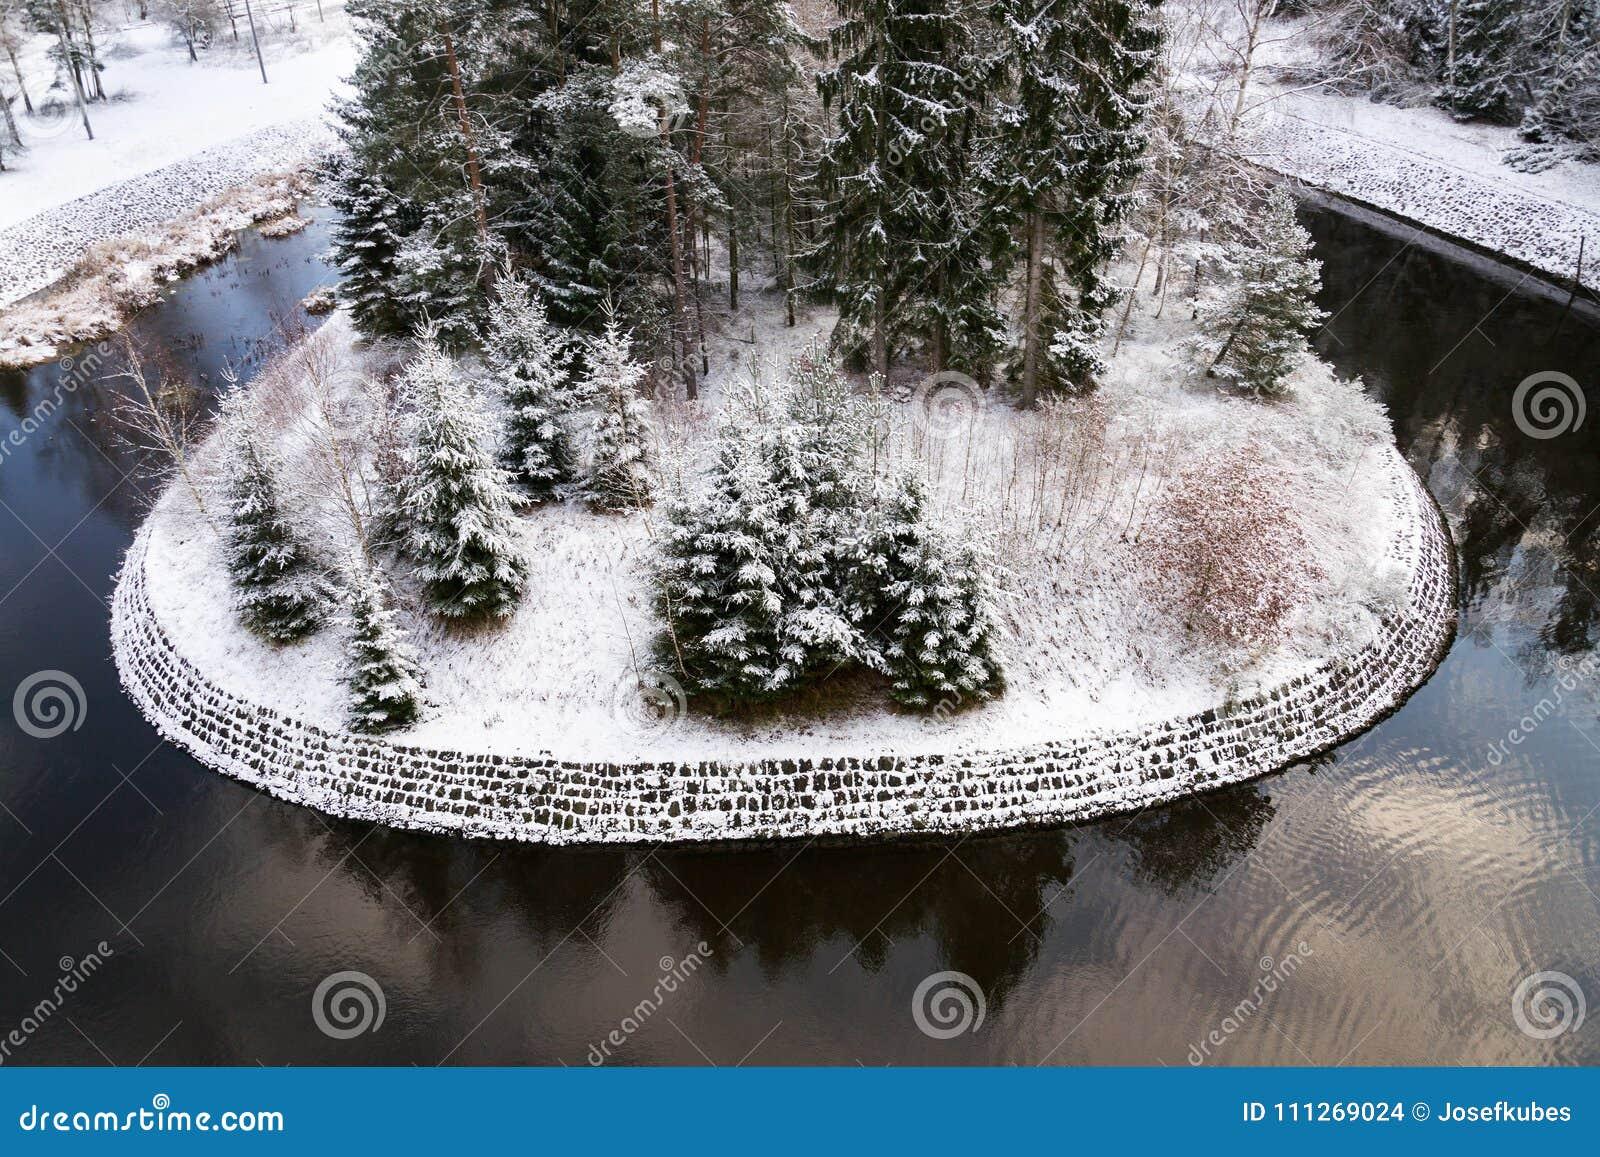 Beautiful snowy winter forest landscape, Tepla River under Brezova dam